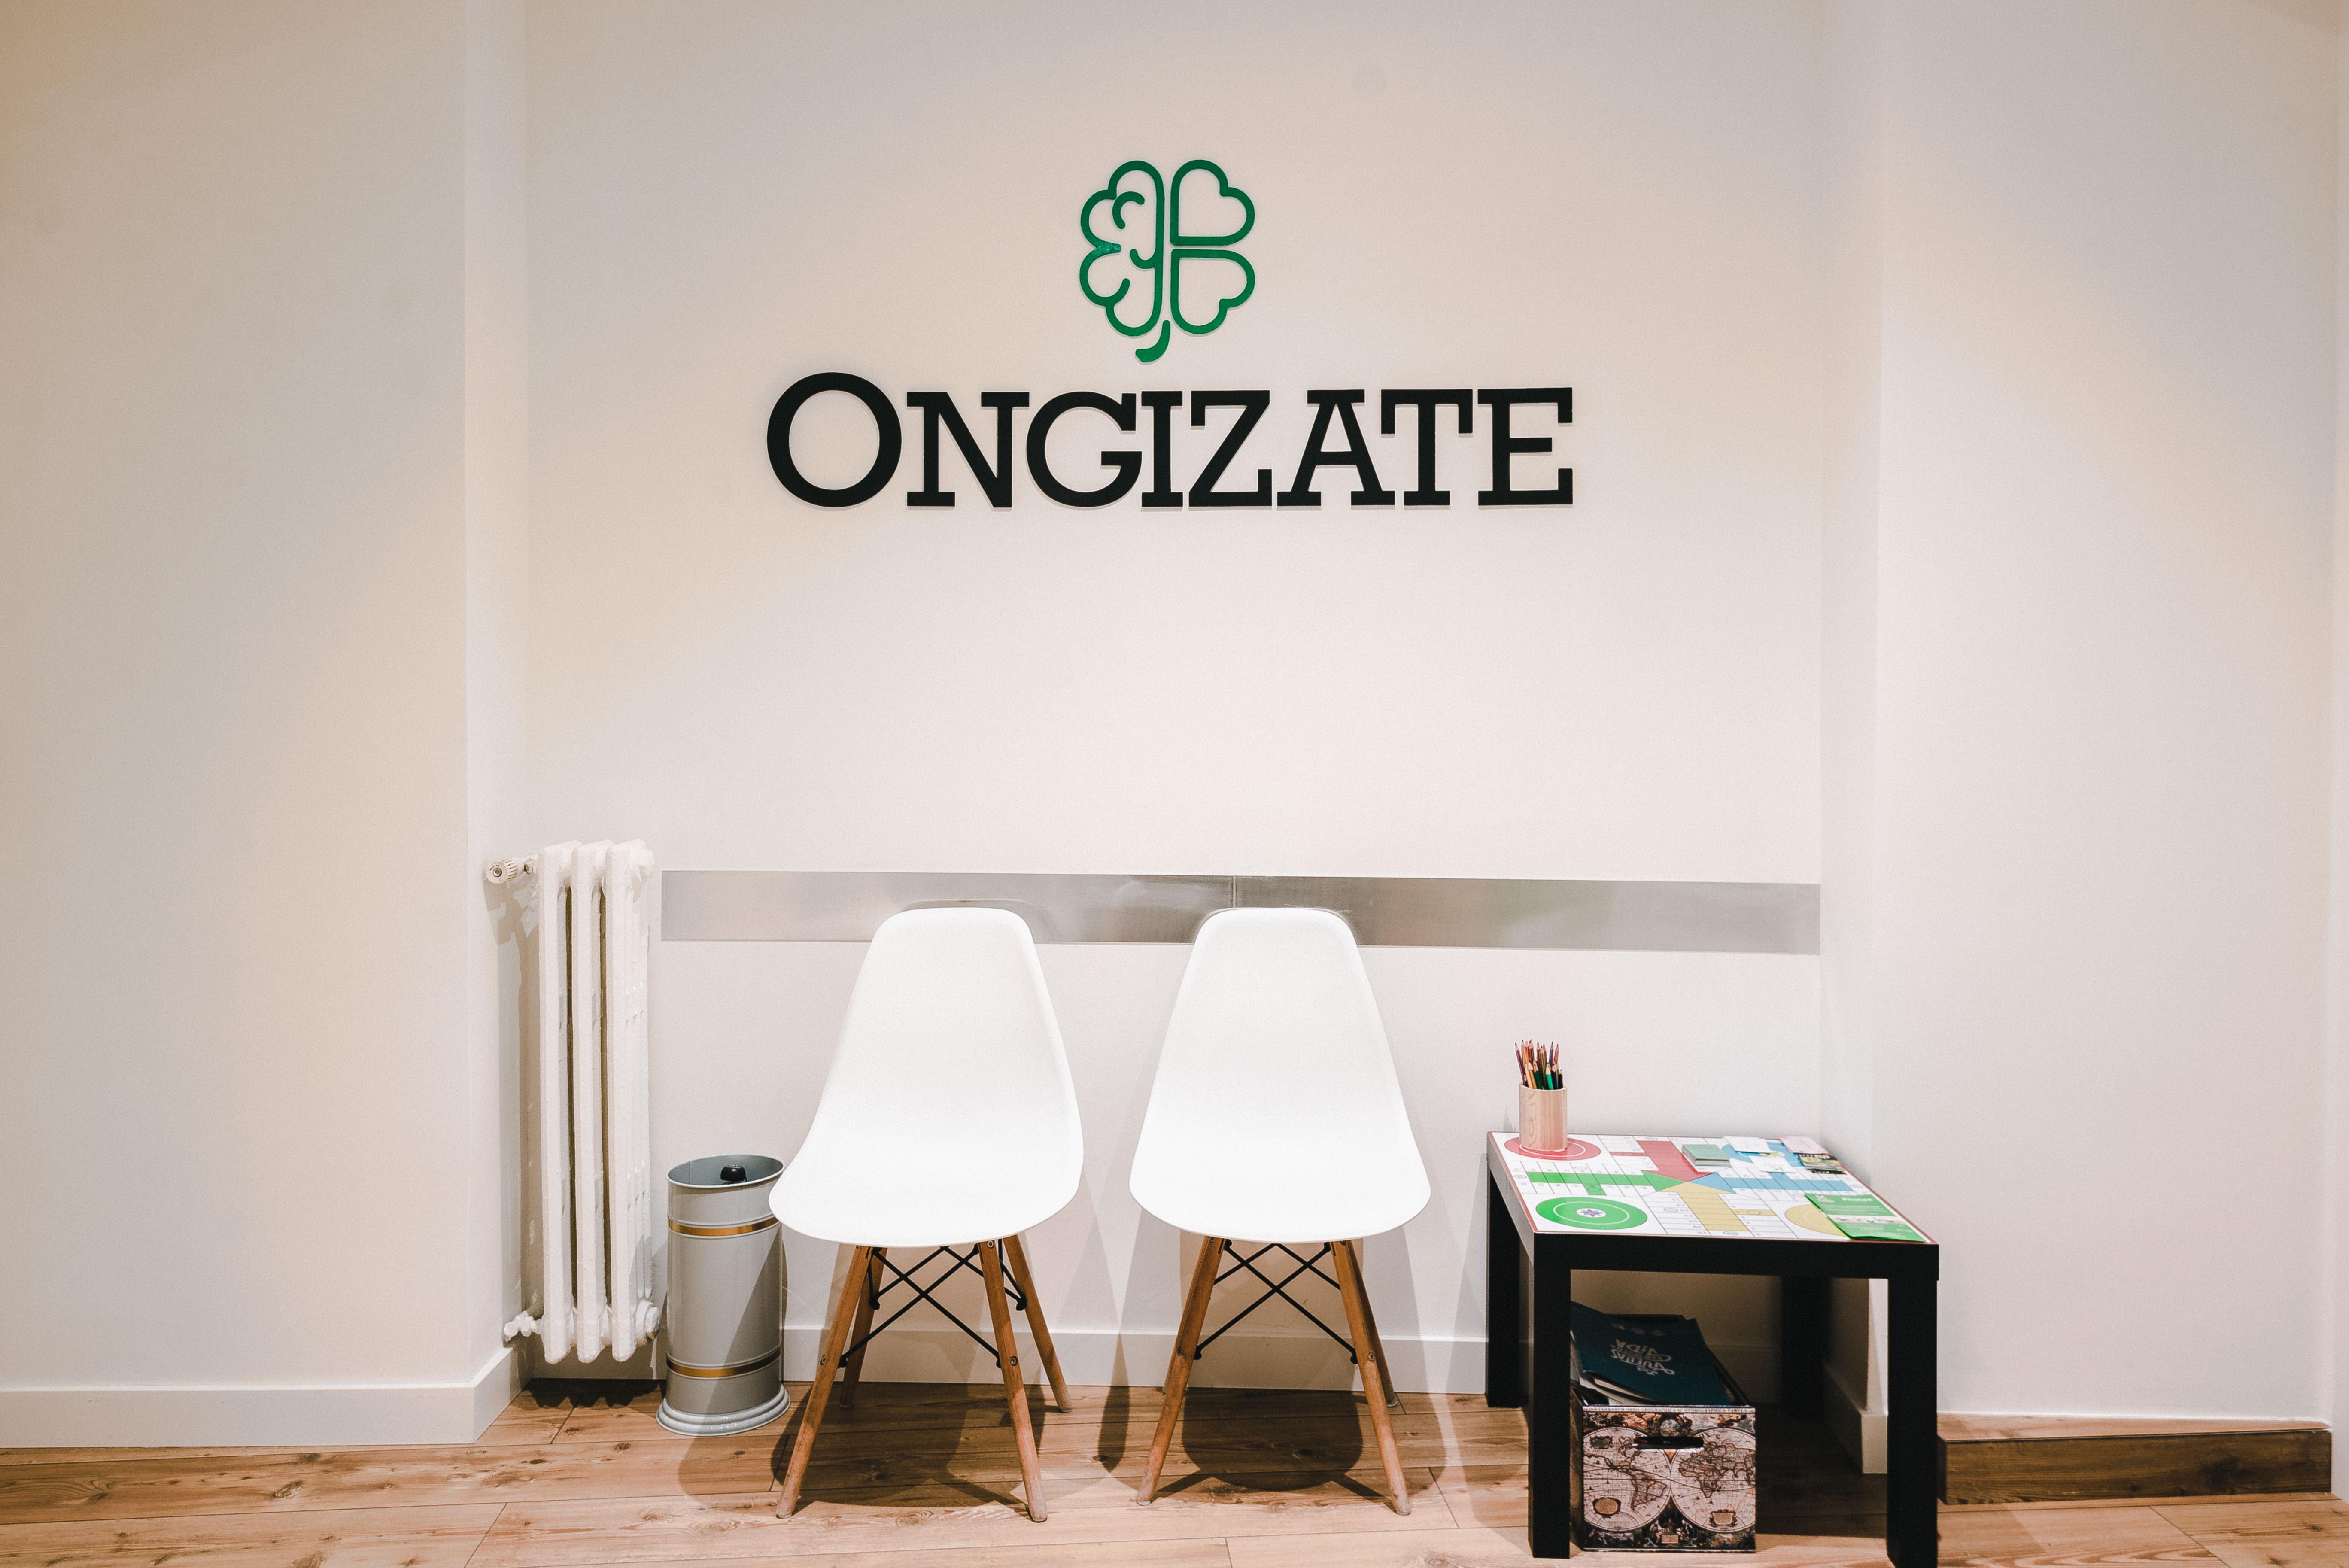 ongizate 10 - Ongizate Psicólogos Bilbao